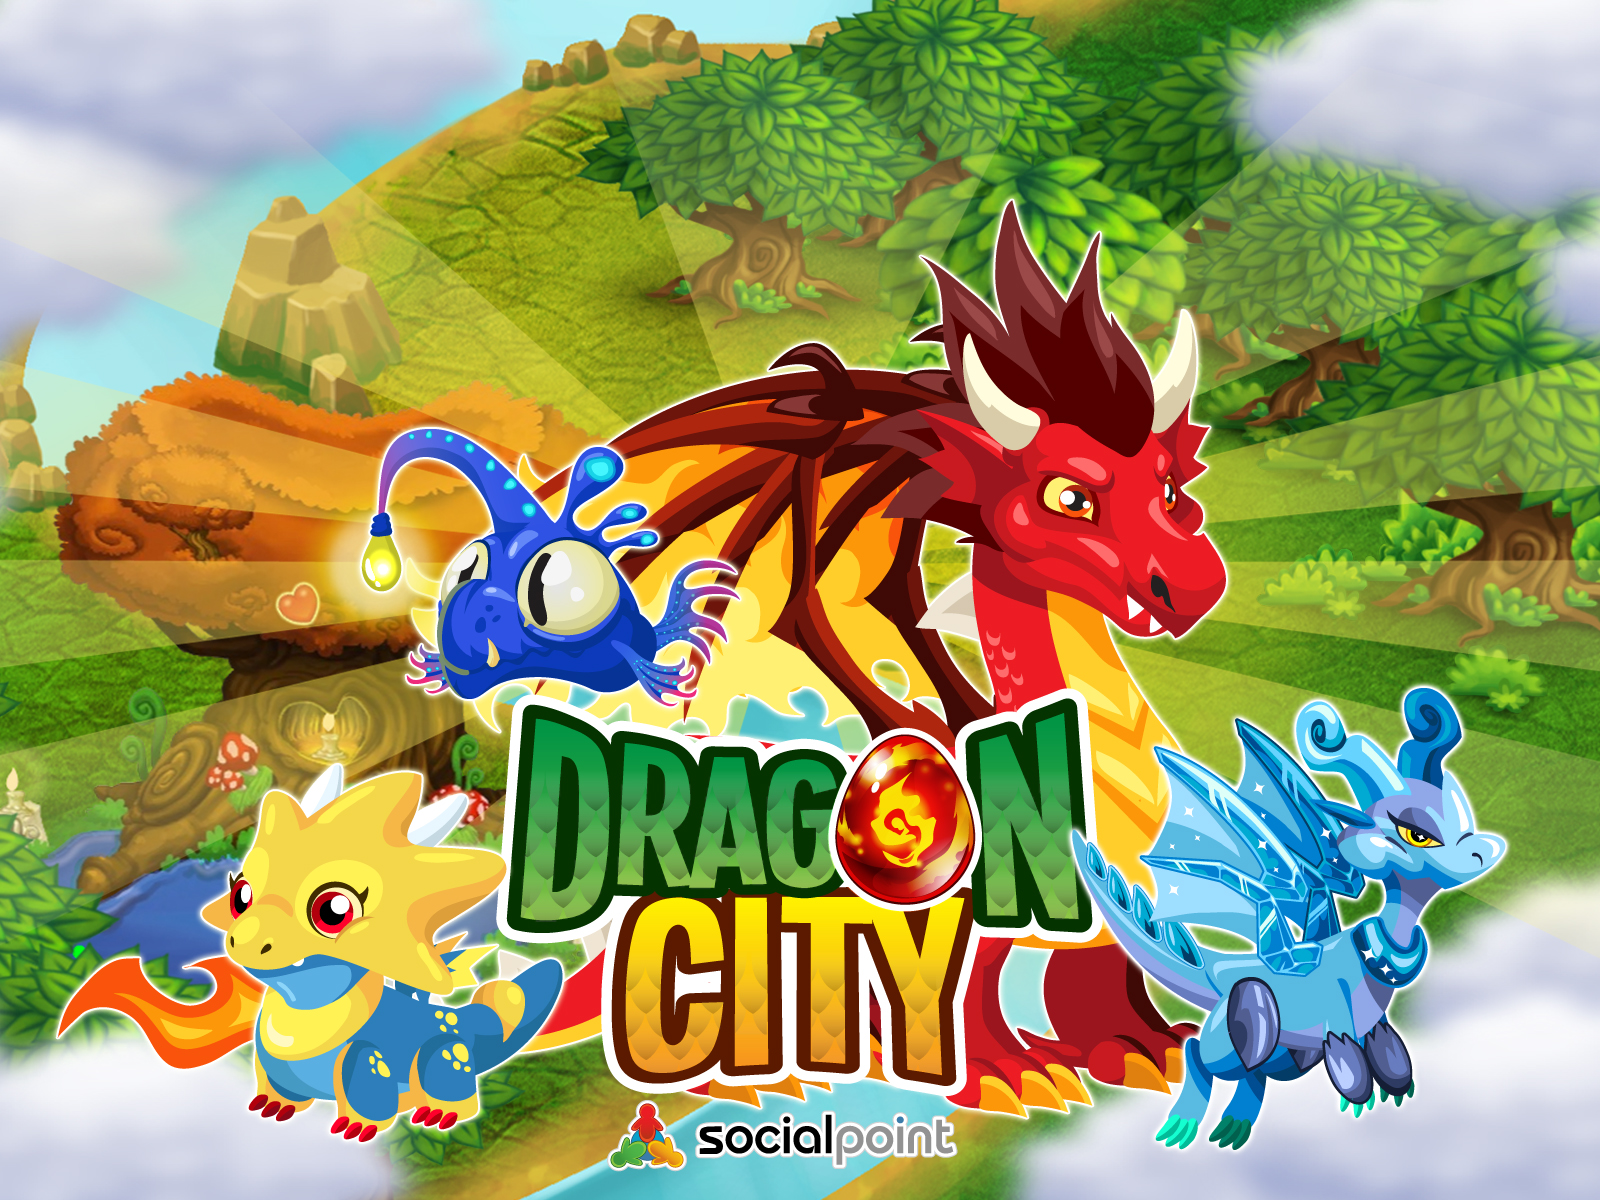 Dragon Citry